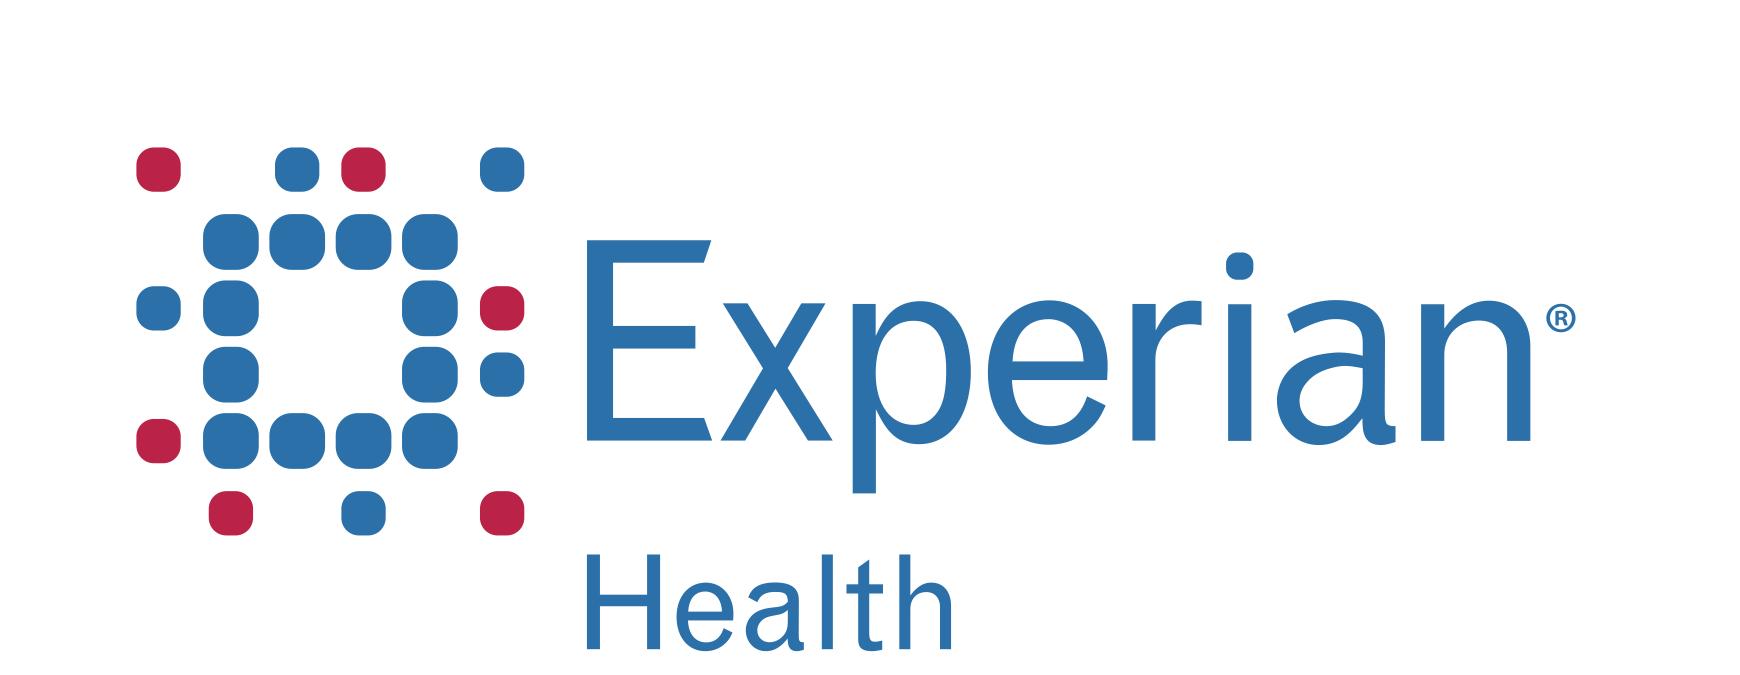 Experian.2053.Logo.v2015.10.02.png